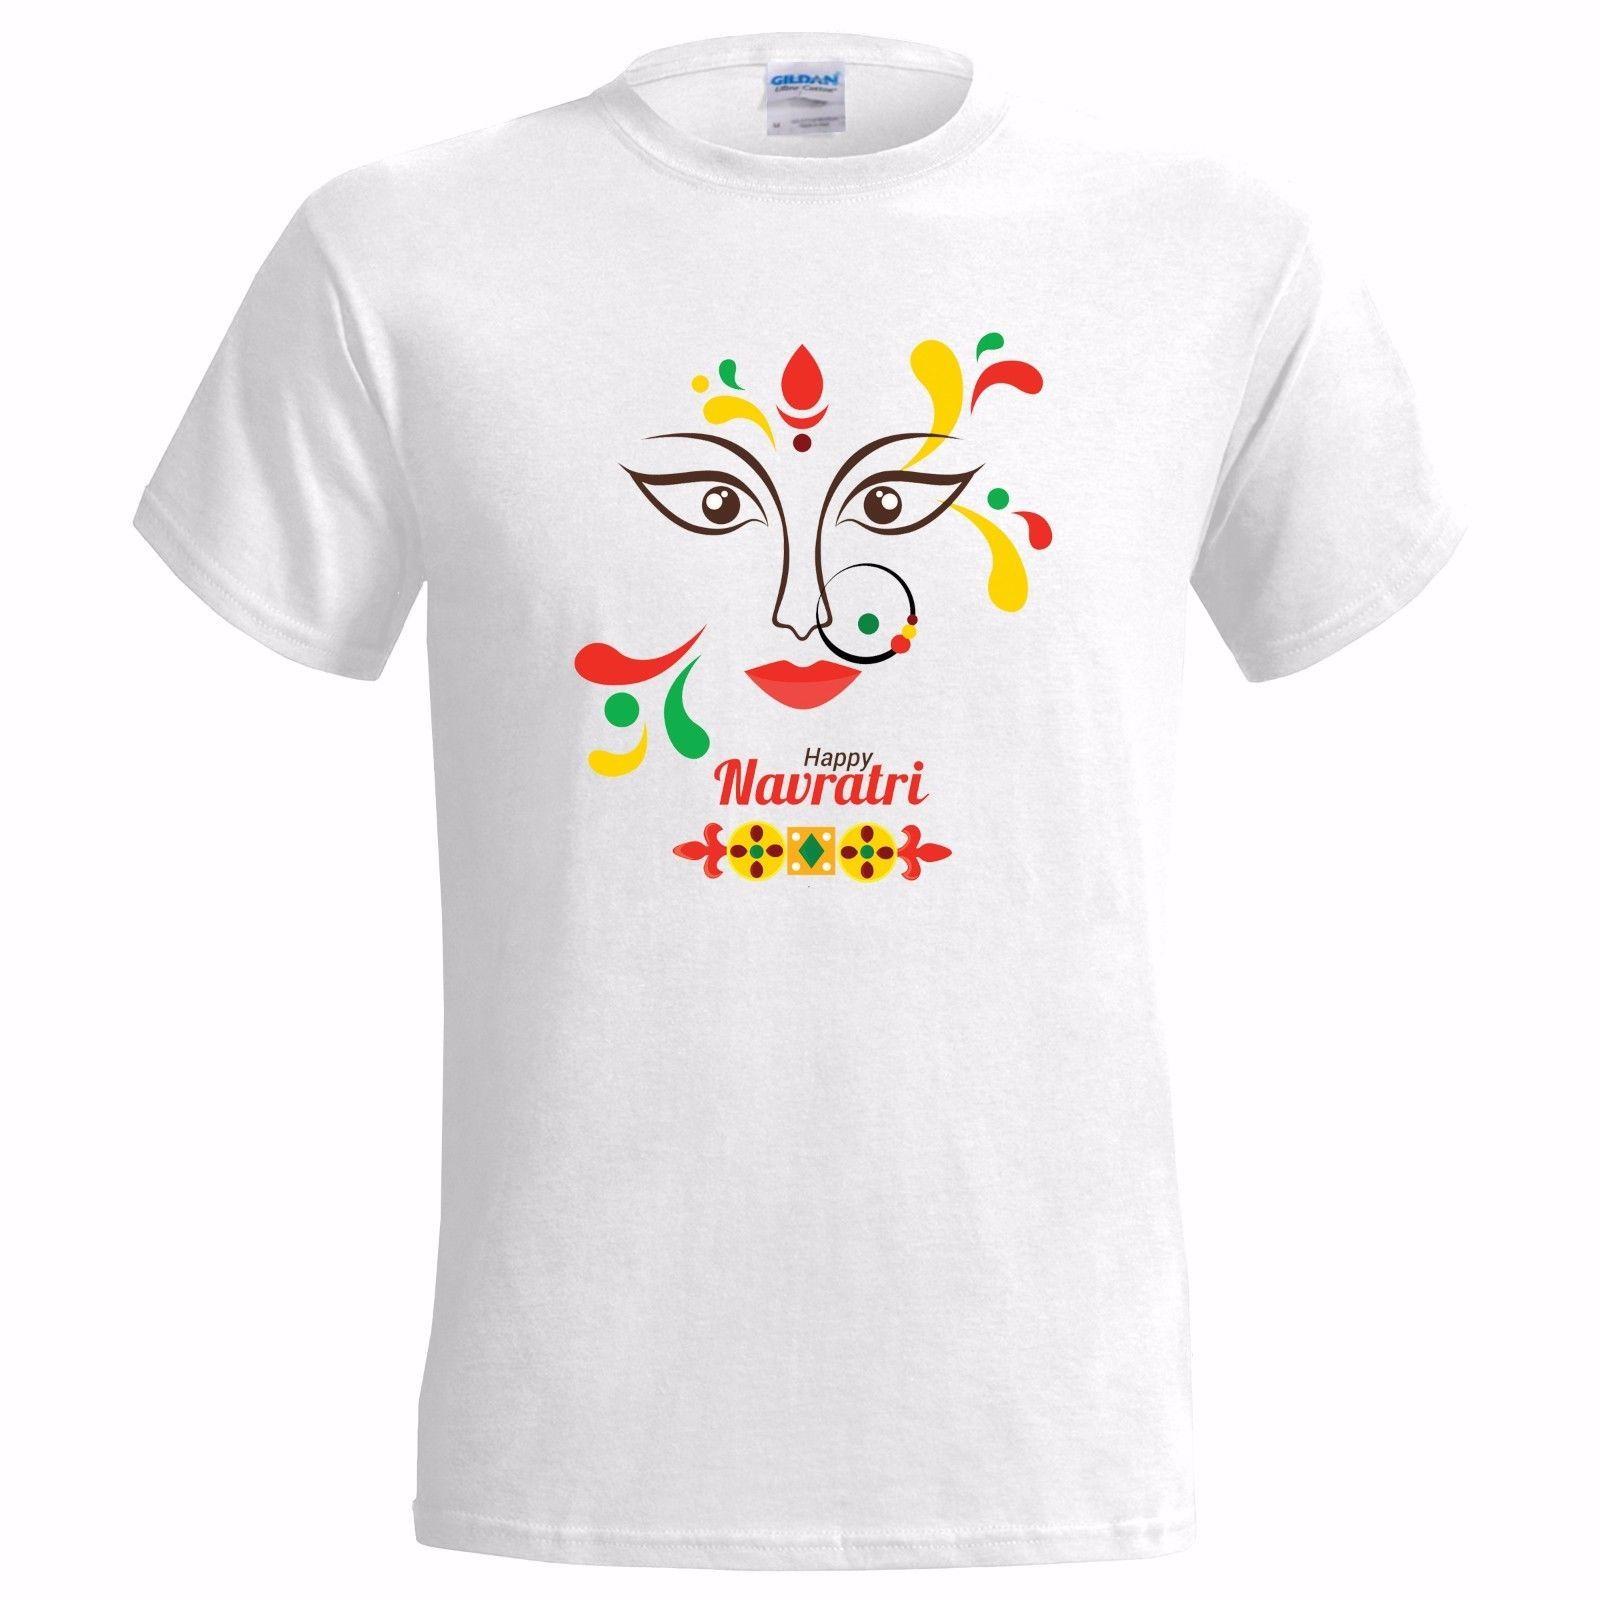 HAPPY NAVRATRI MENS T SHIRT MAA DURGA HINDU HINDUISM FESTIVAL HINDI INDIAN  Designer White T Shirt Printed T Shirts Funny From Thatsmyshirt f46b895de